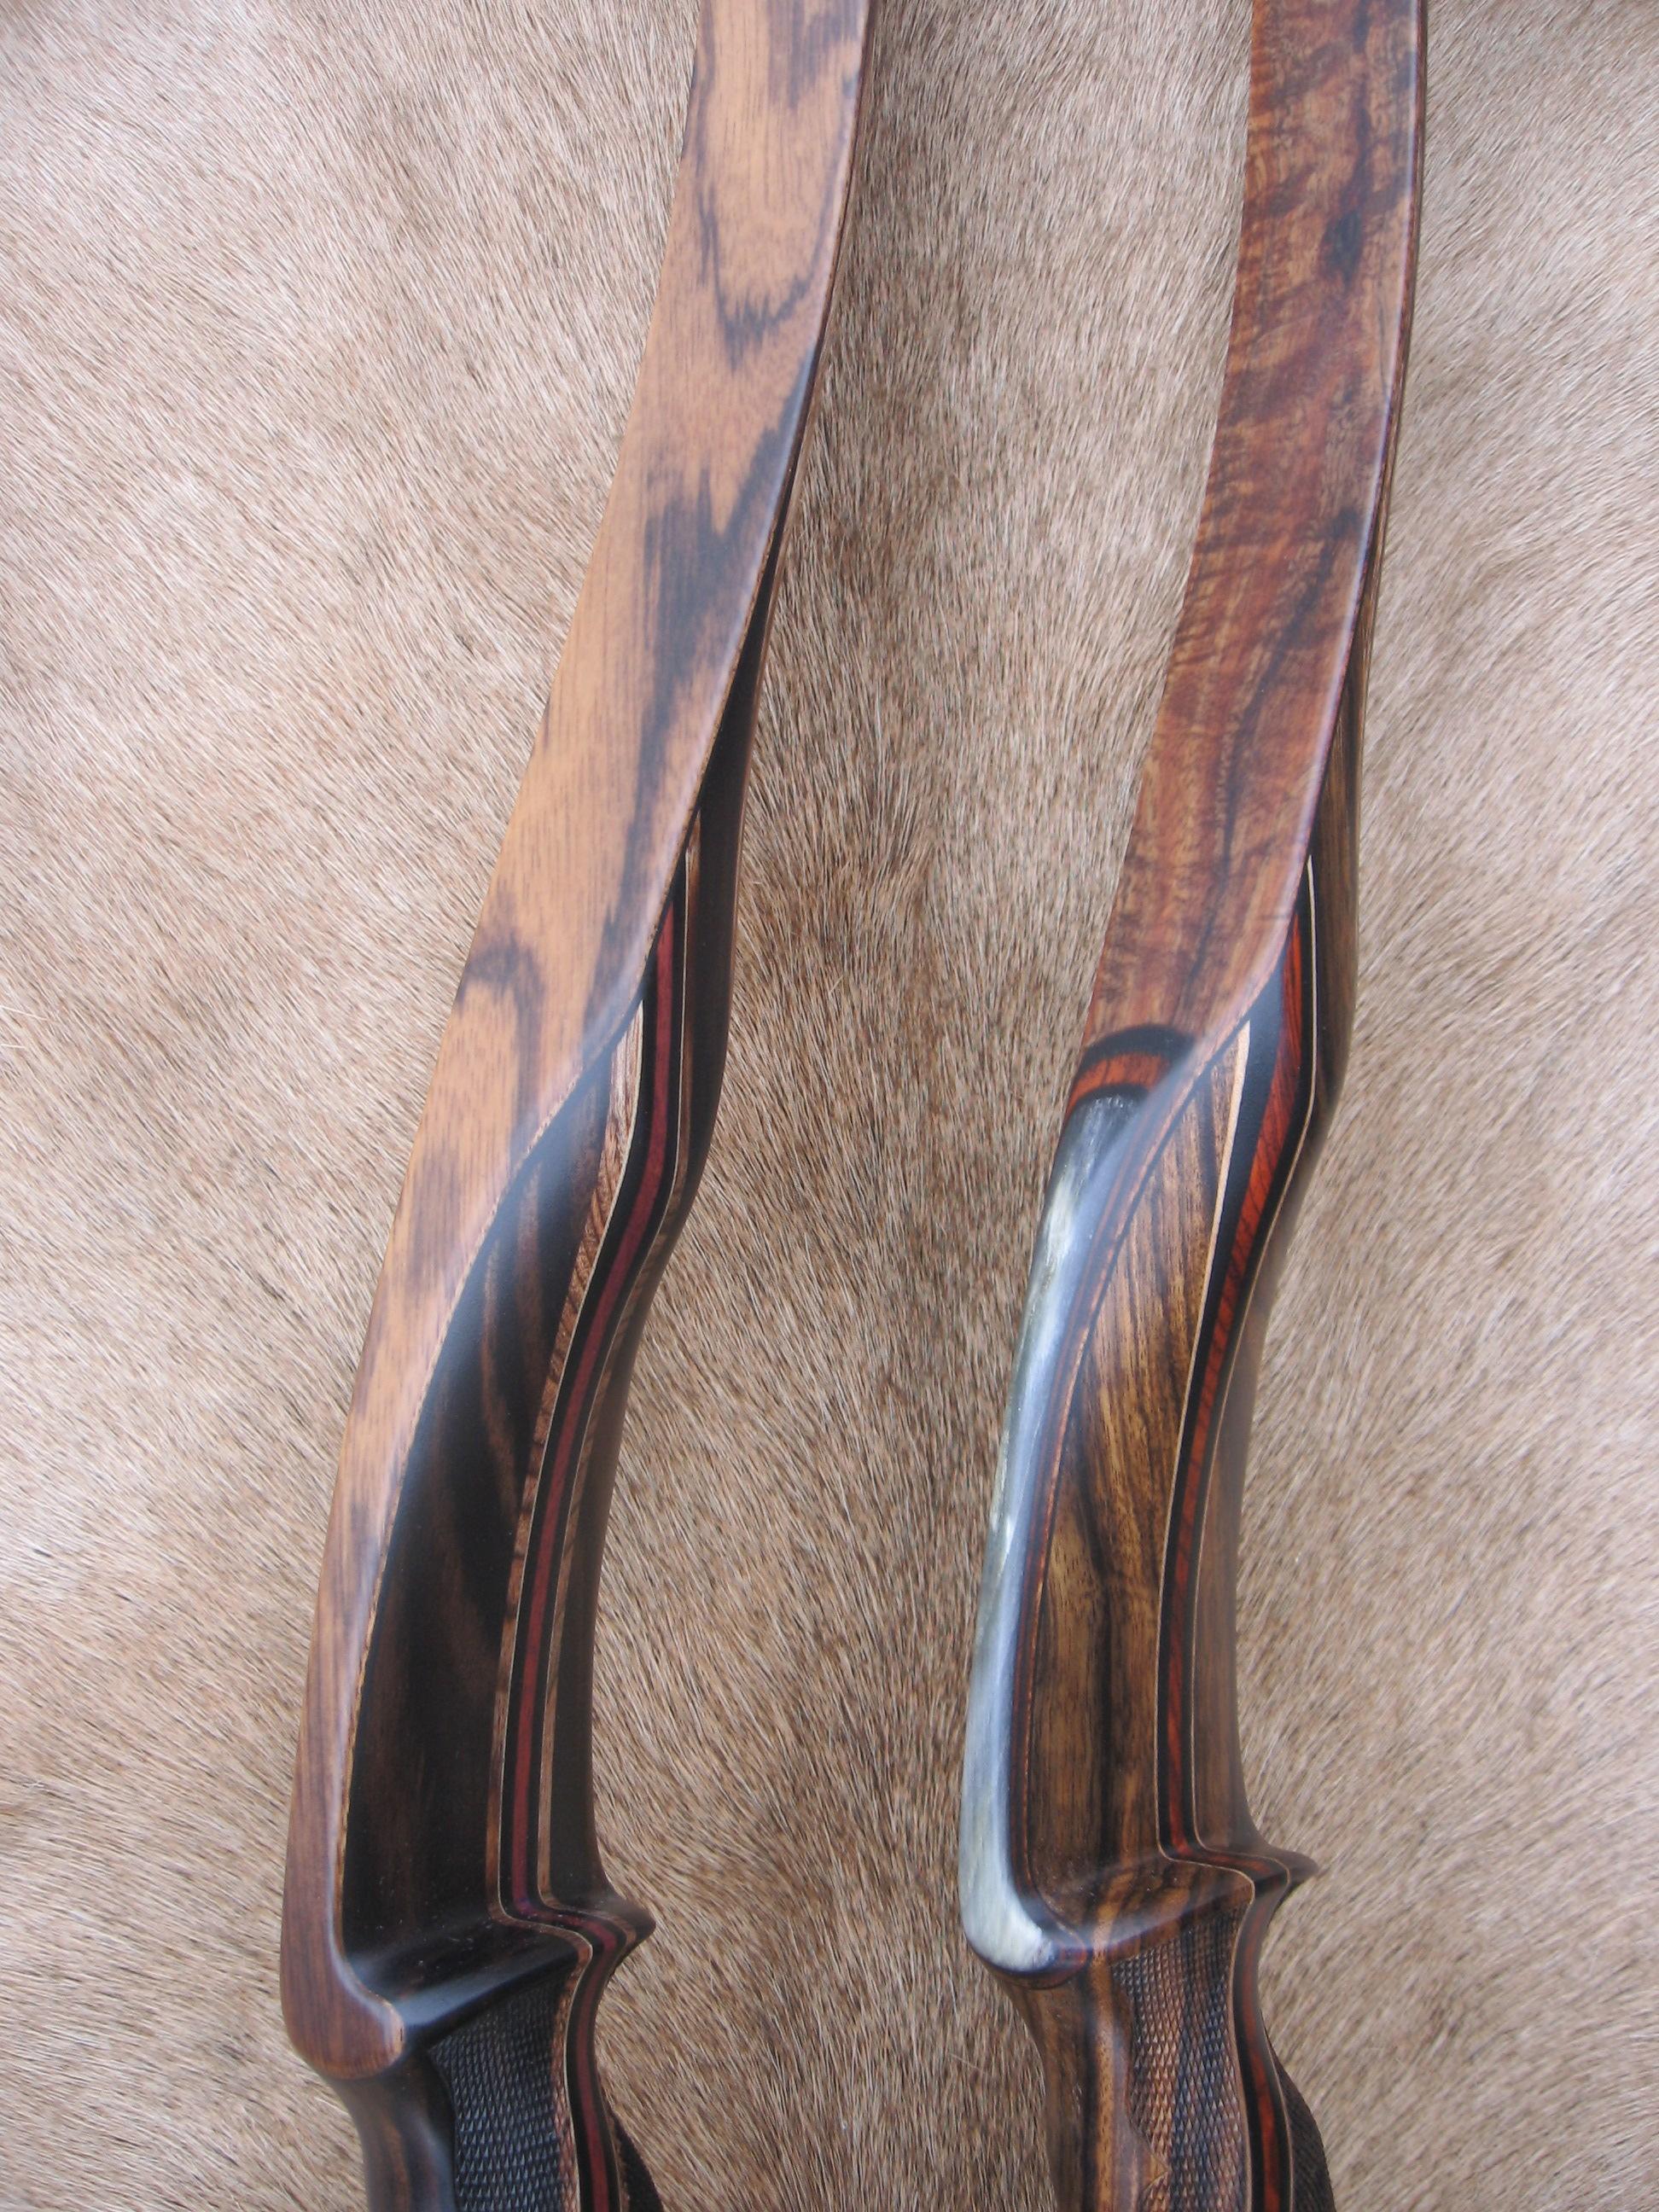 Left to Right  Macassar Handle/Zebrawood Limbs  Shedua Handle/Koa Limbs